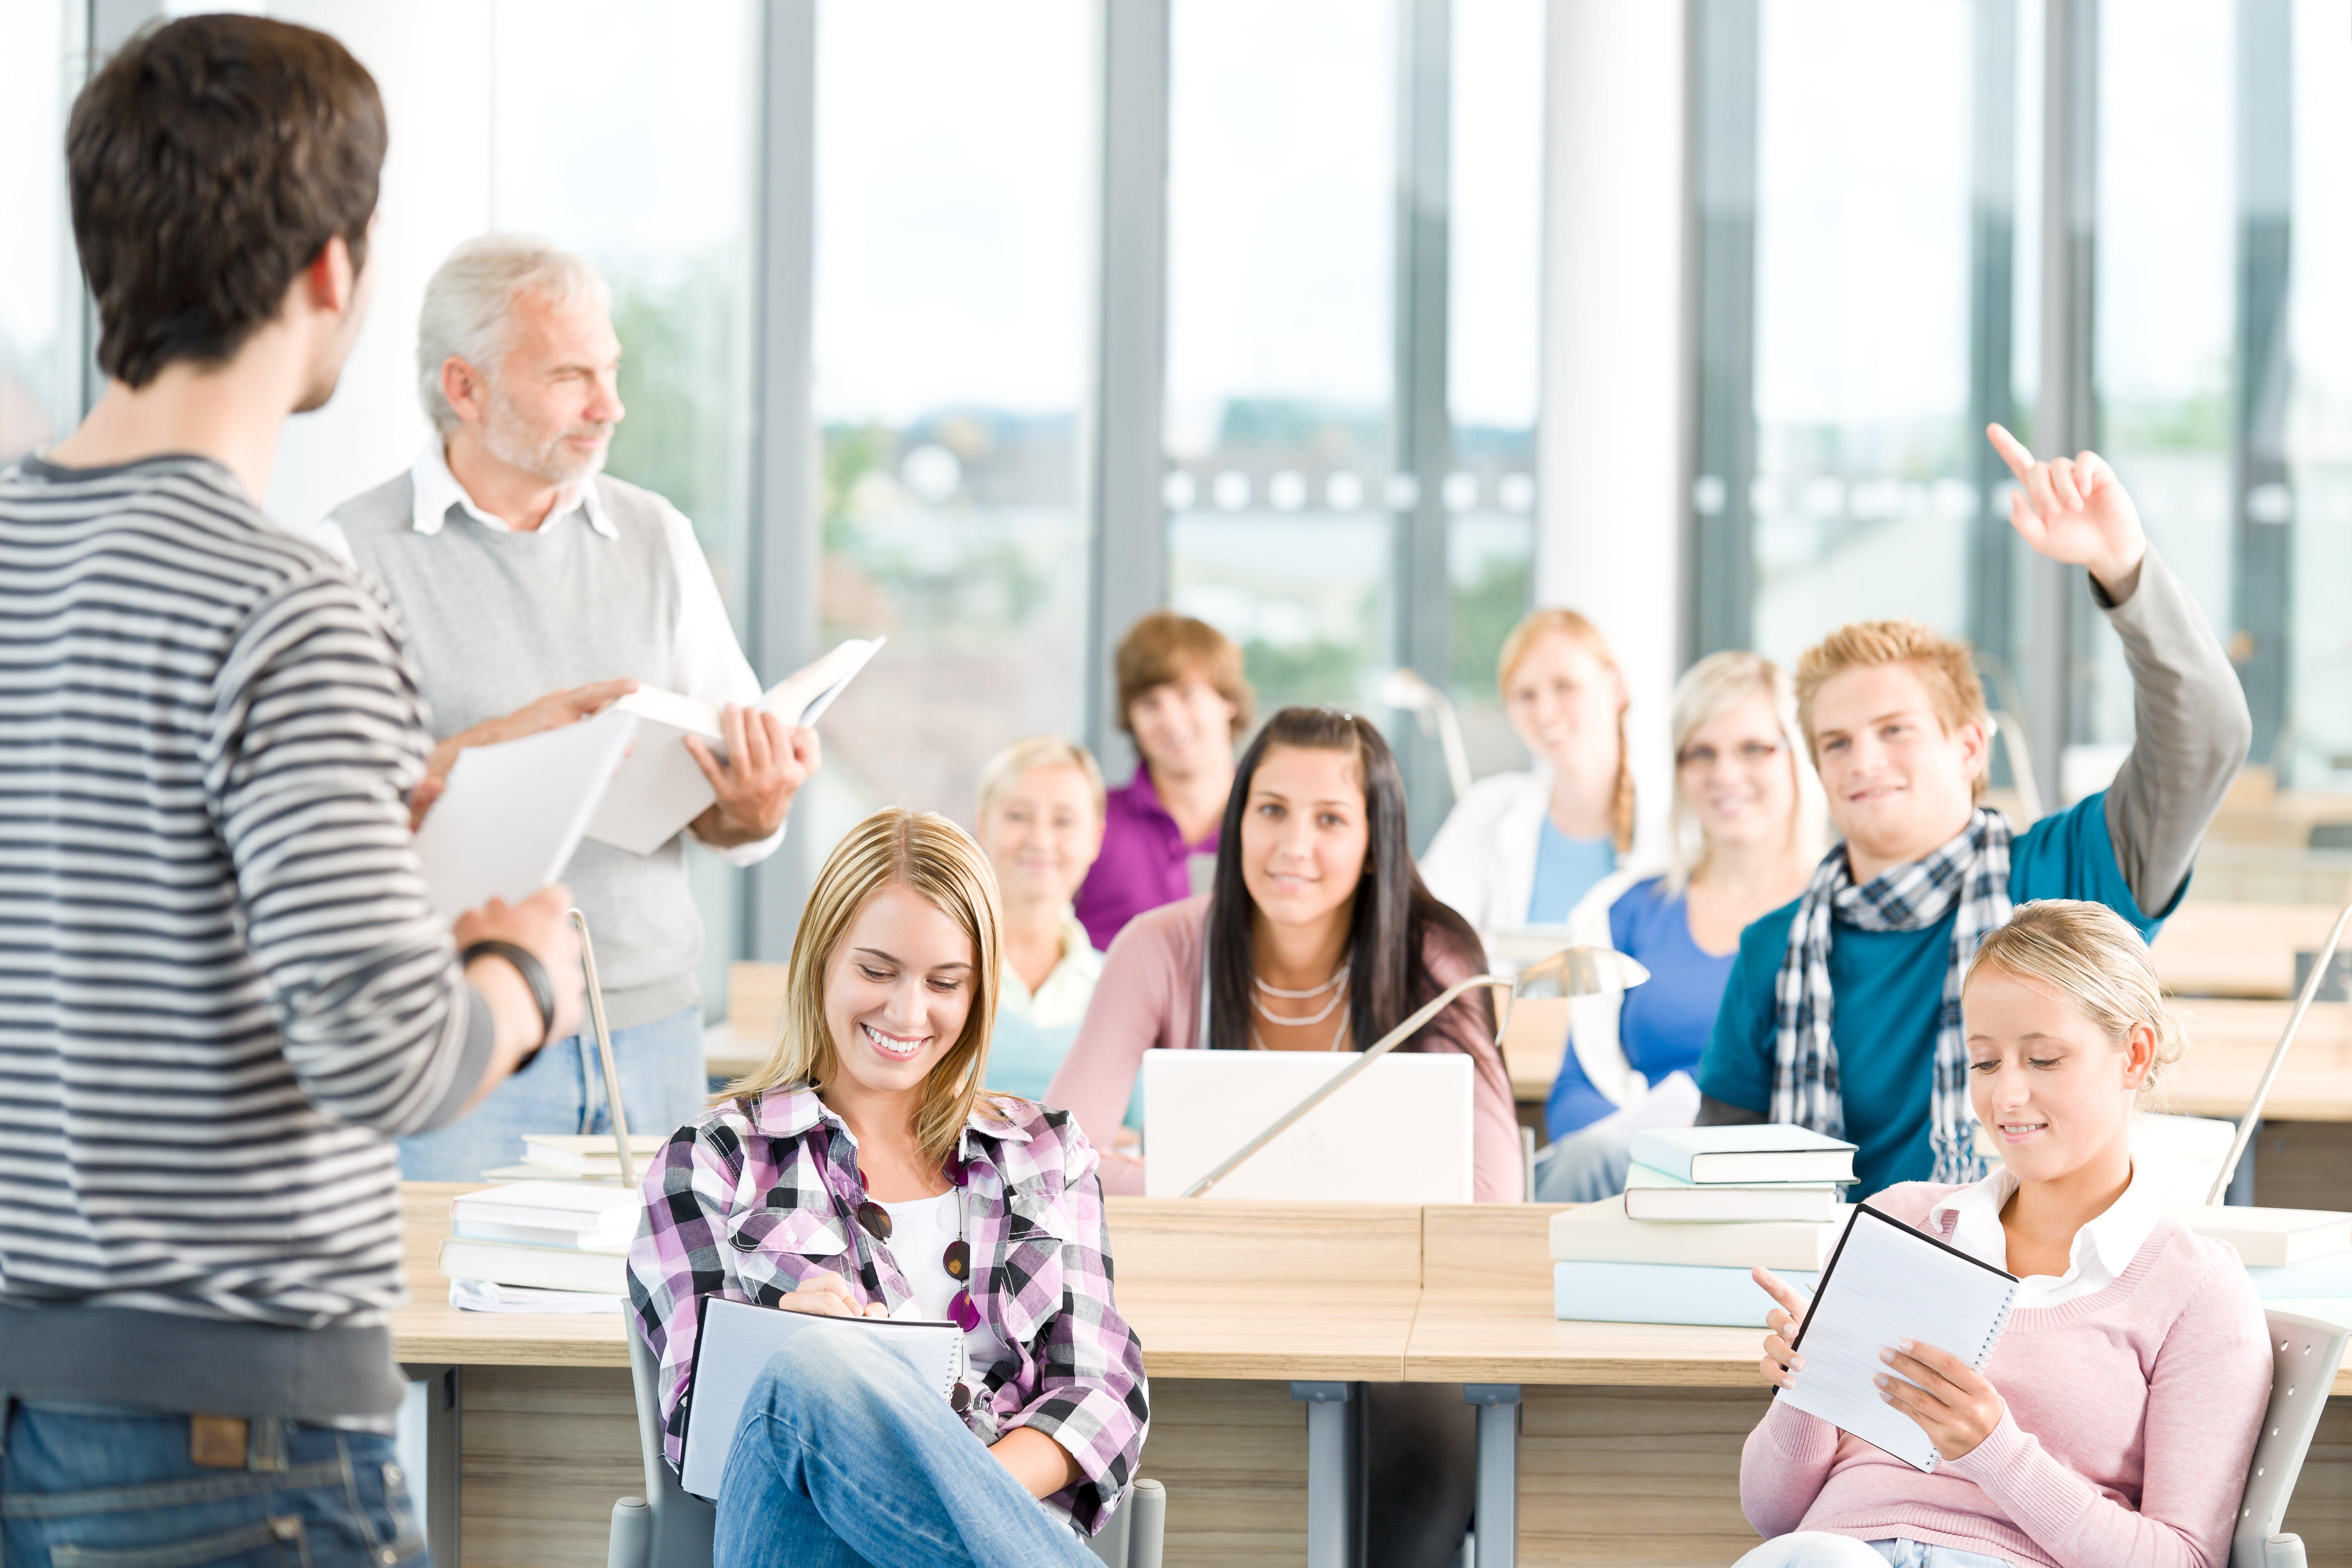 marketing-evolution-start-student-run-business-analytics-agency